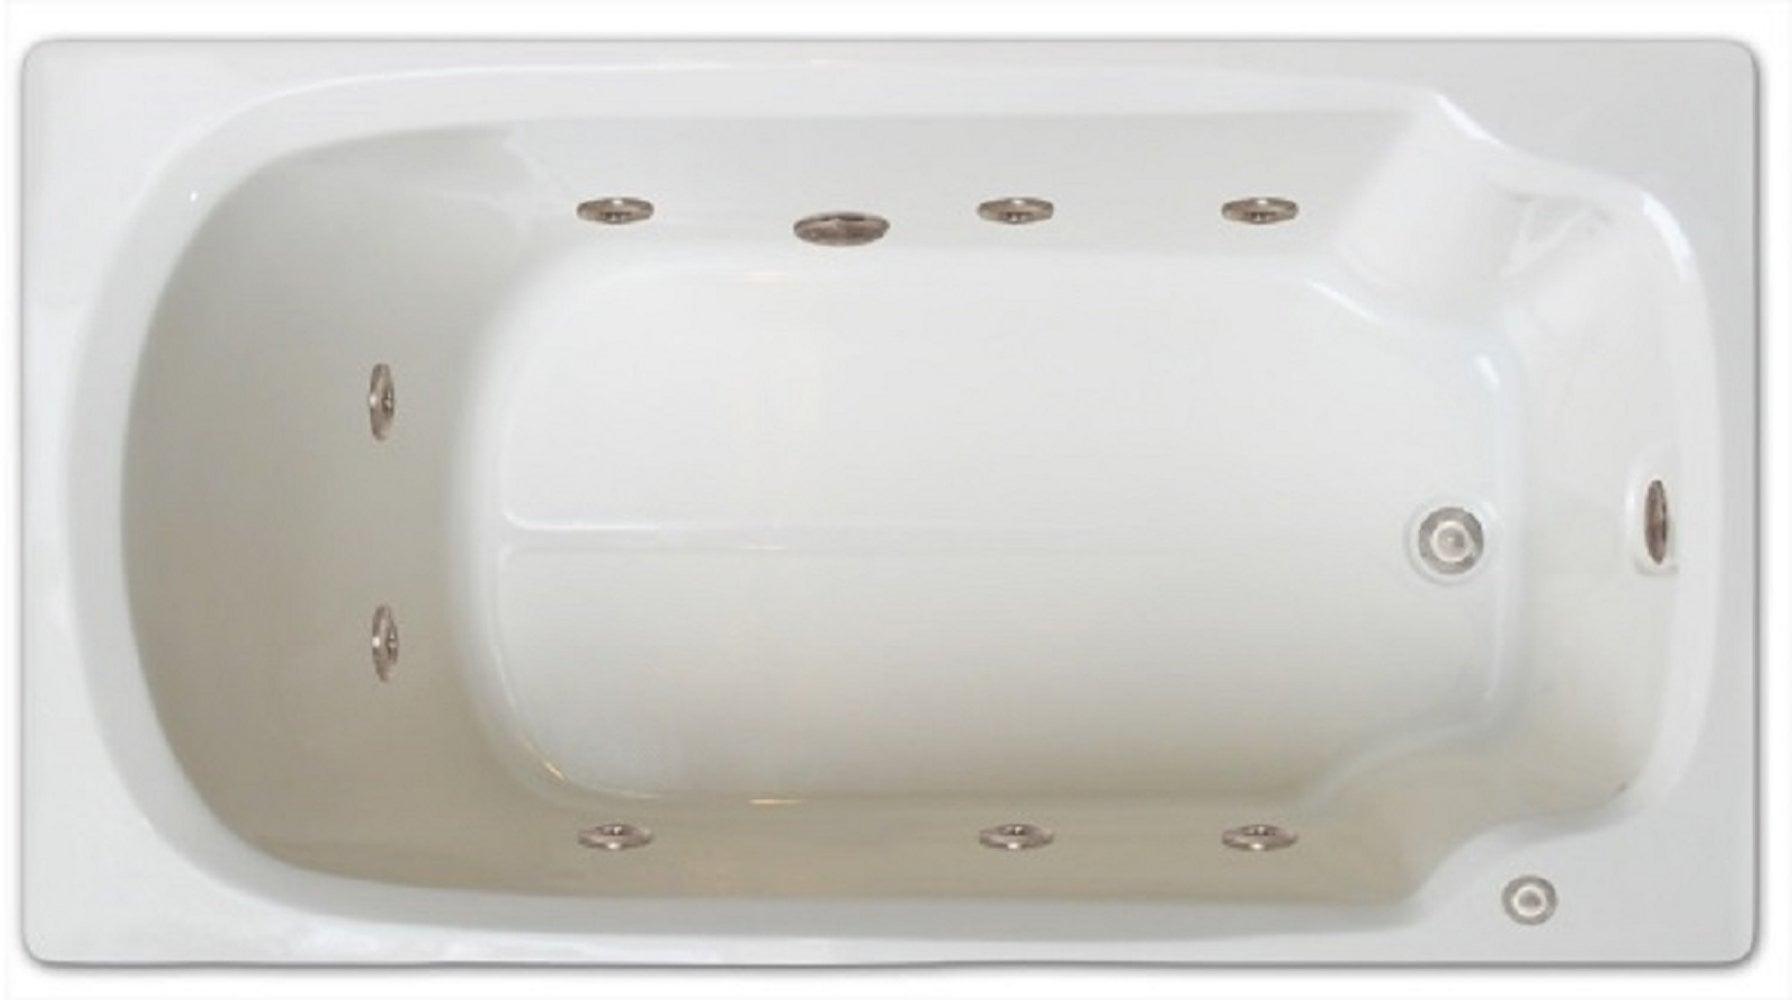 Drop-in Bathtub / 60x32x17.5 / high gloss white acrylic / Rectangle / LPI13-W-LD Pinnacle Bath - Whirlpool 0